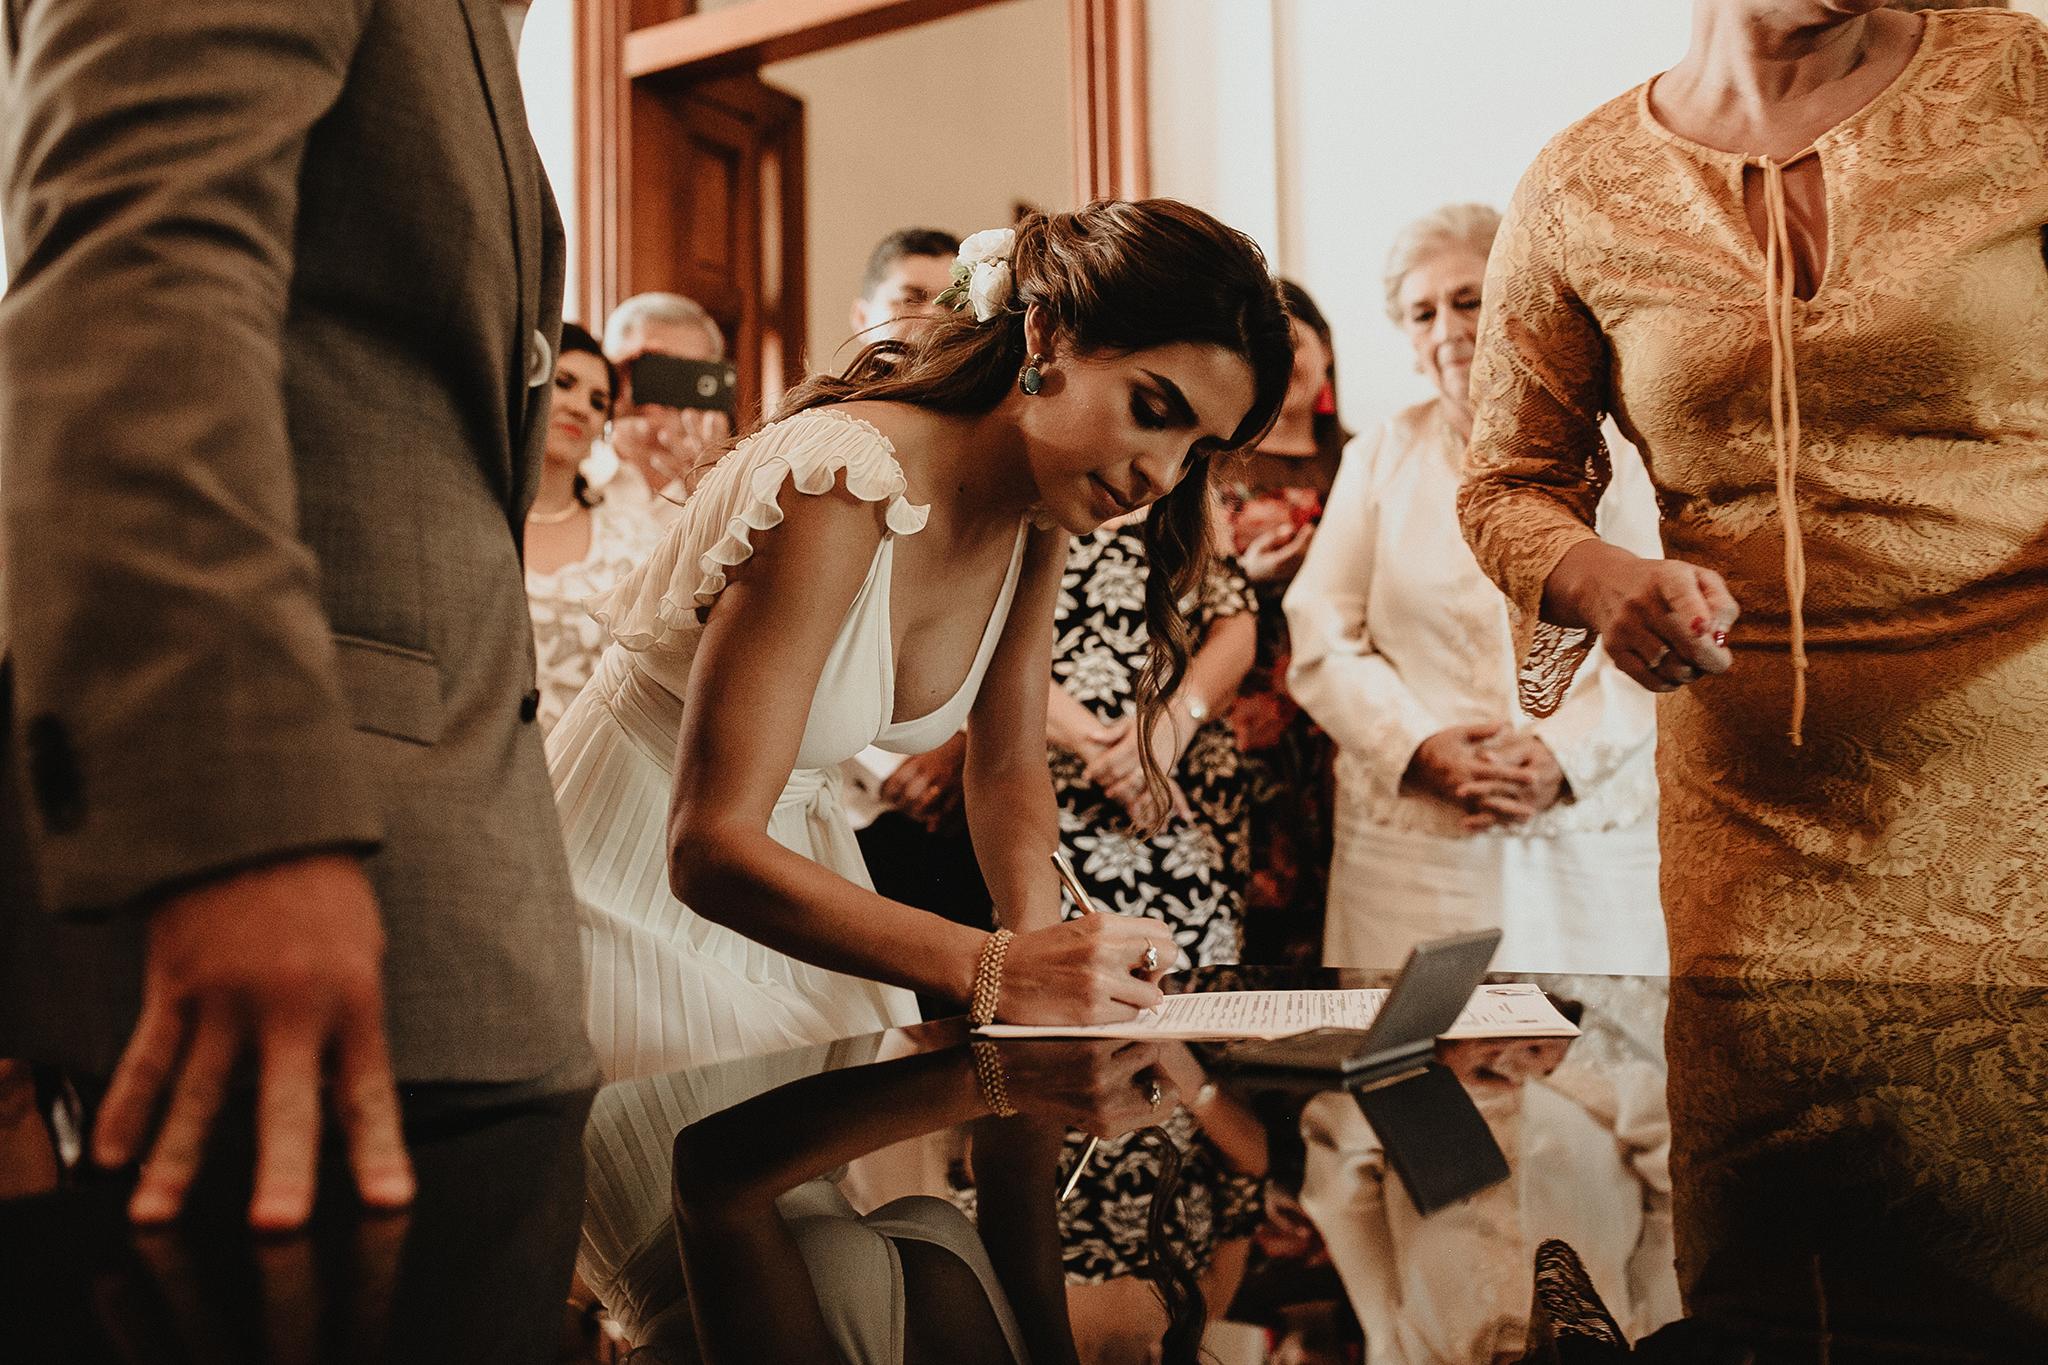 0099civil_Hacienda_WeddingDstination_MeridaYucatan_HaciendasMerida_BodasMexico_BodasYucatan_Boda_Destino.jpg